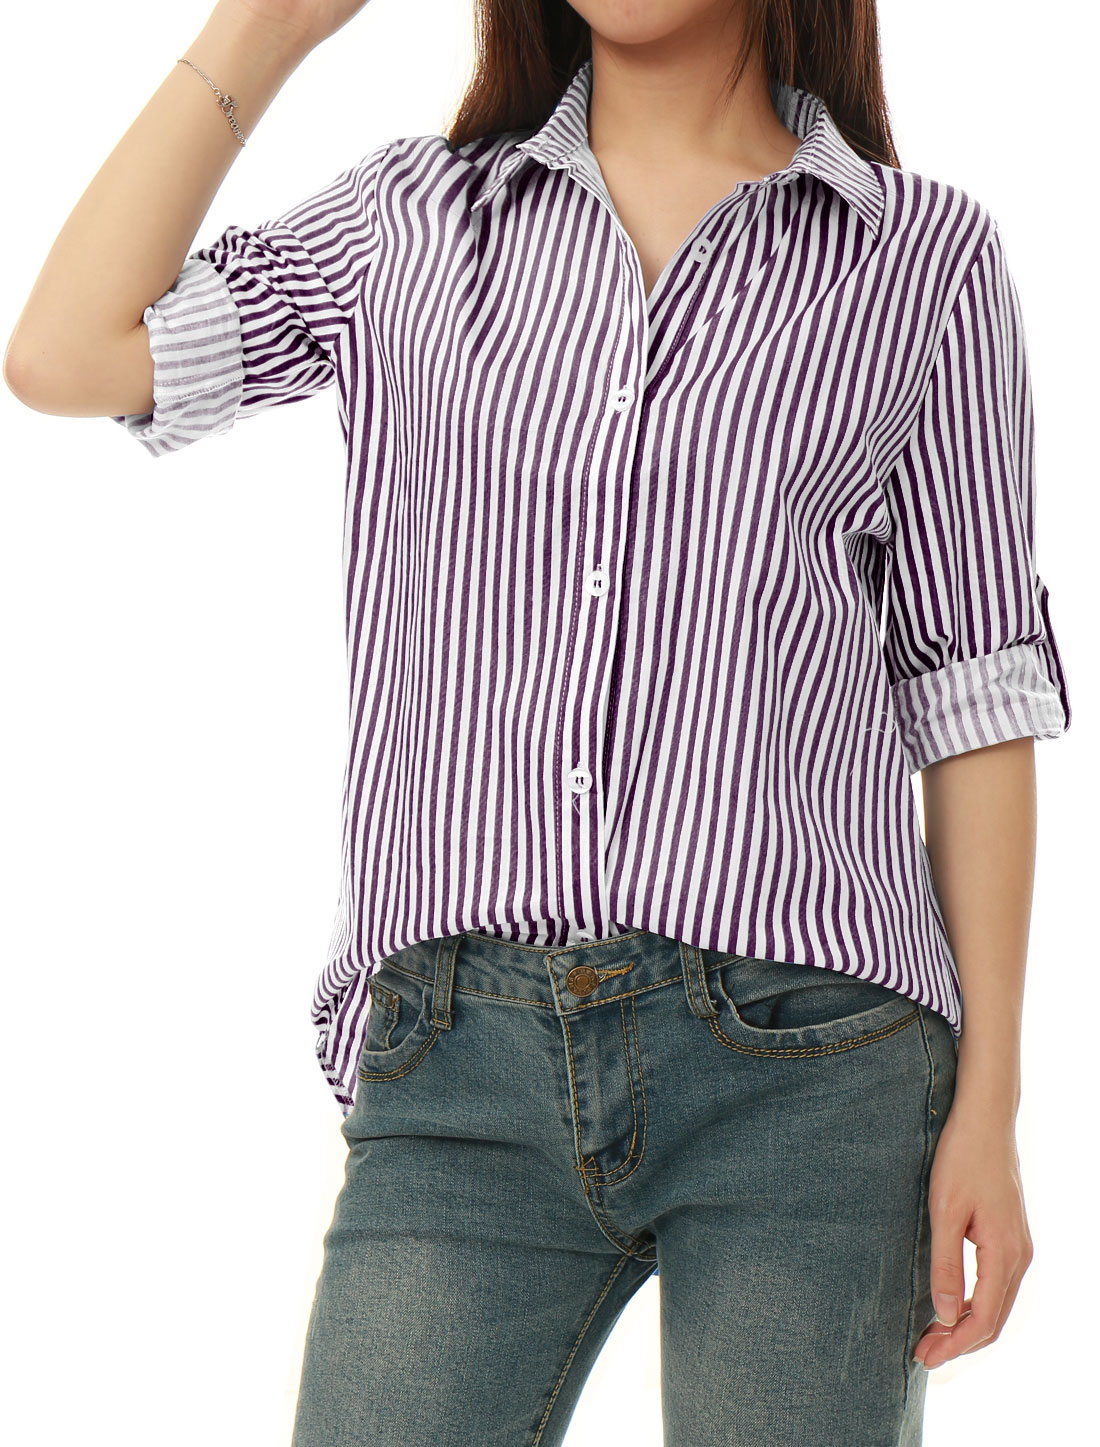 Allegra K Women Striped High Low Hem Roll Up Sleeves Shirt Dark